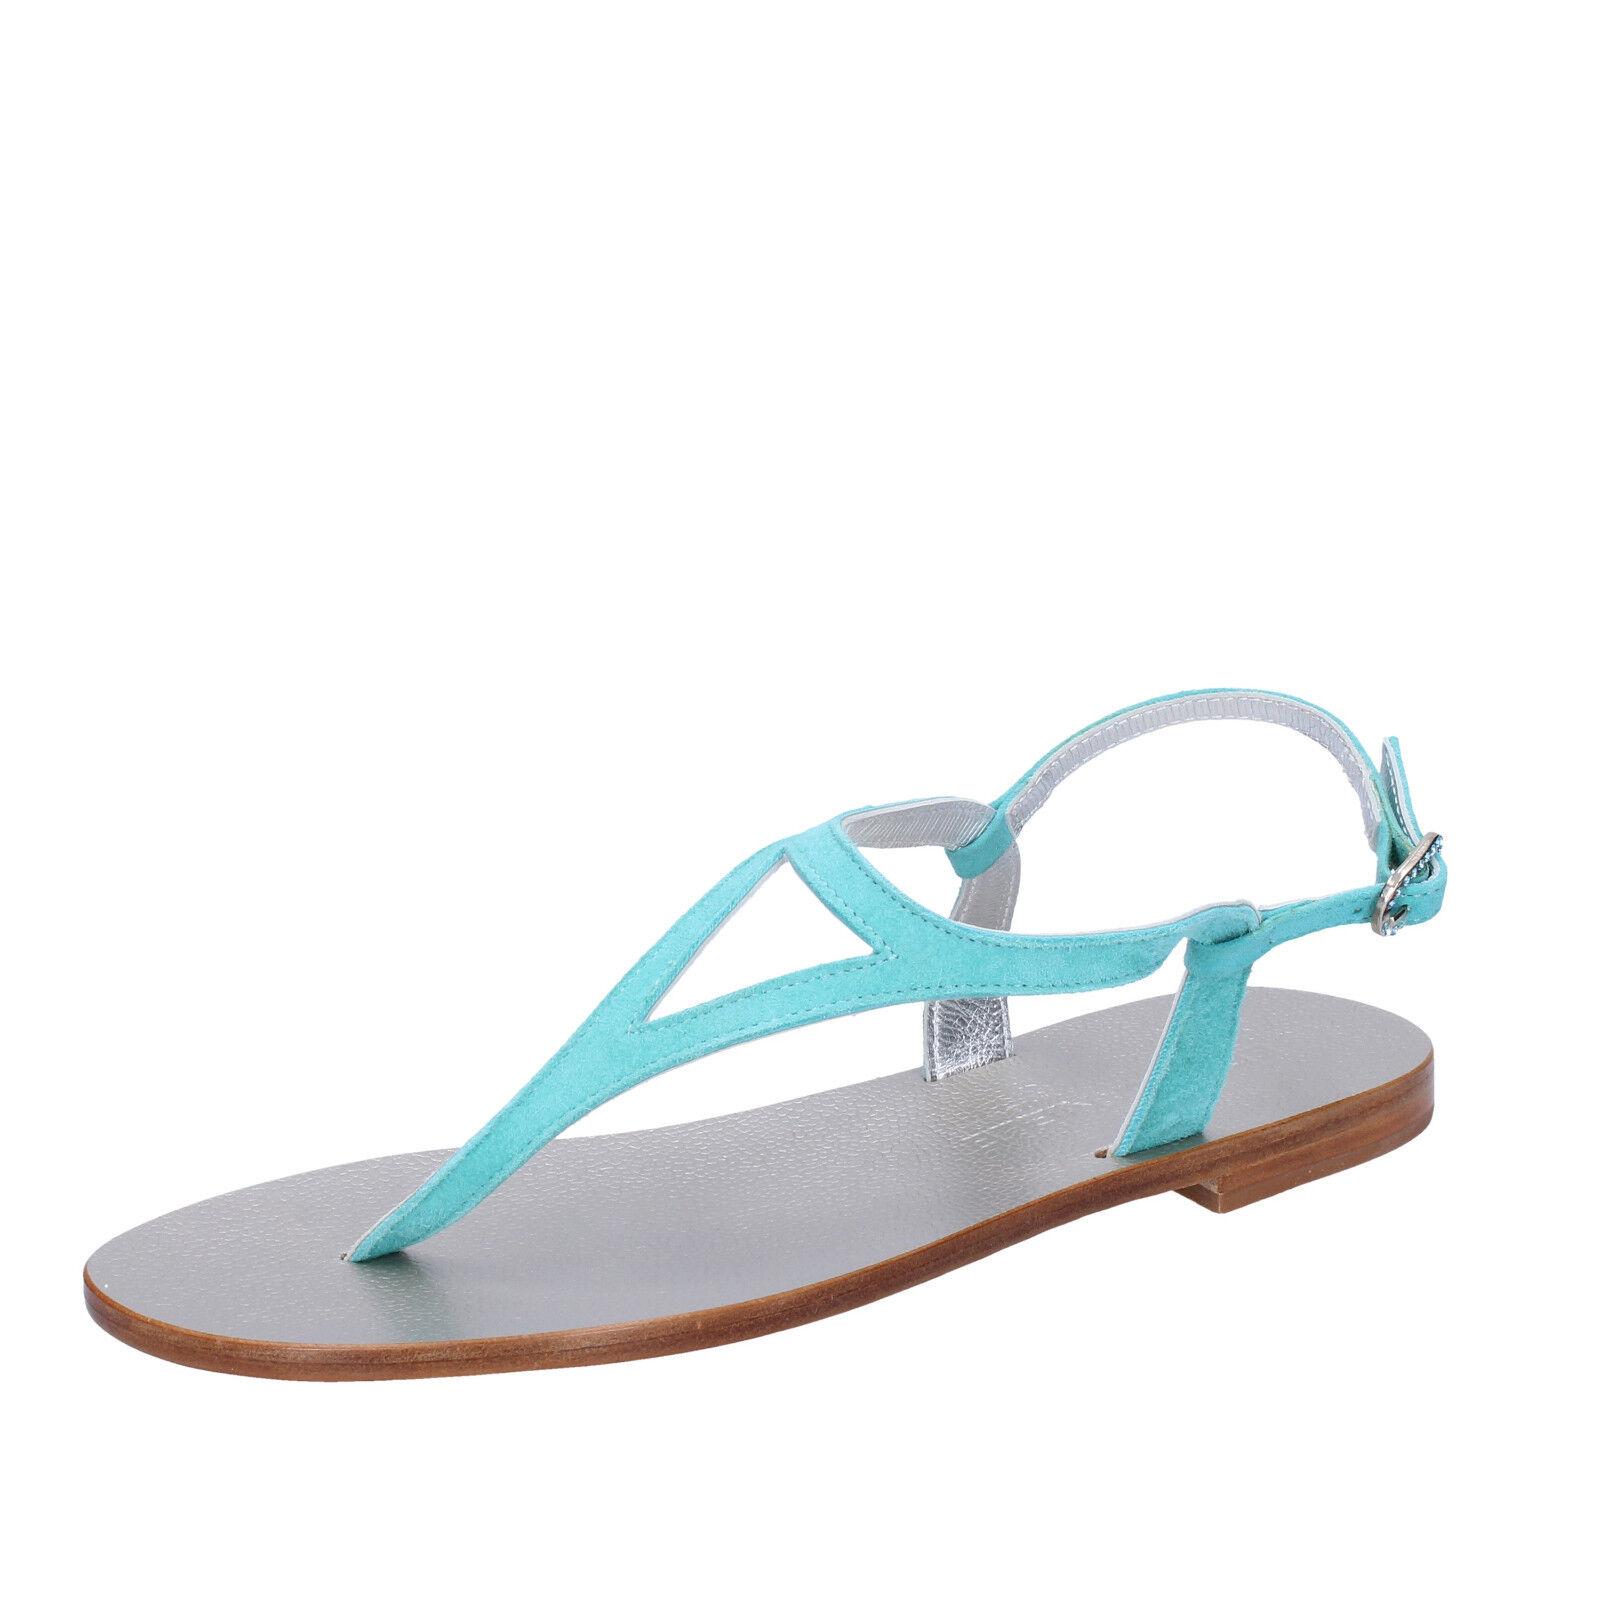 outlet store f6b09 c6397 Damen EU schuhe EDDY DANIELE 37 EU Damen sandalen hellblau wildleder AW520  04e25d